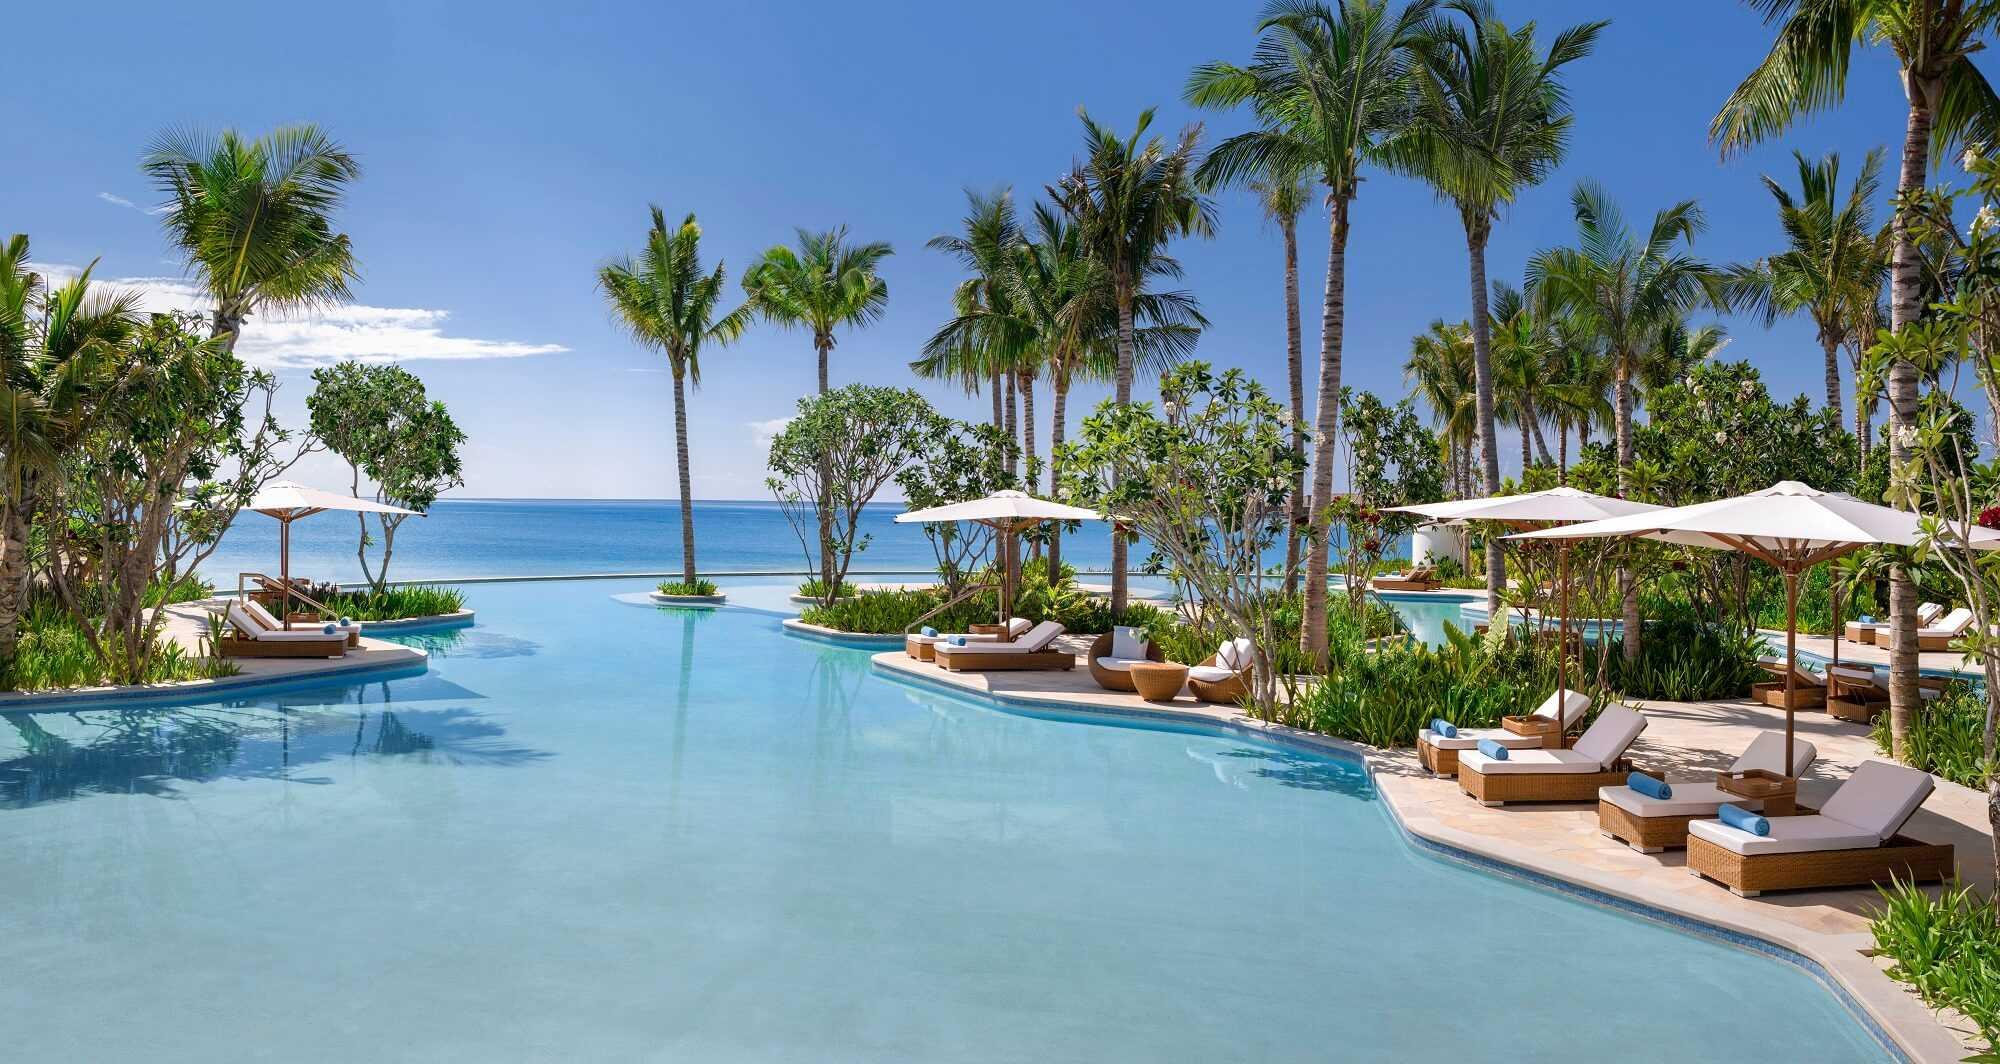 Waldorf Astoria Maldives Pool